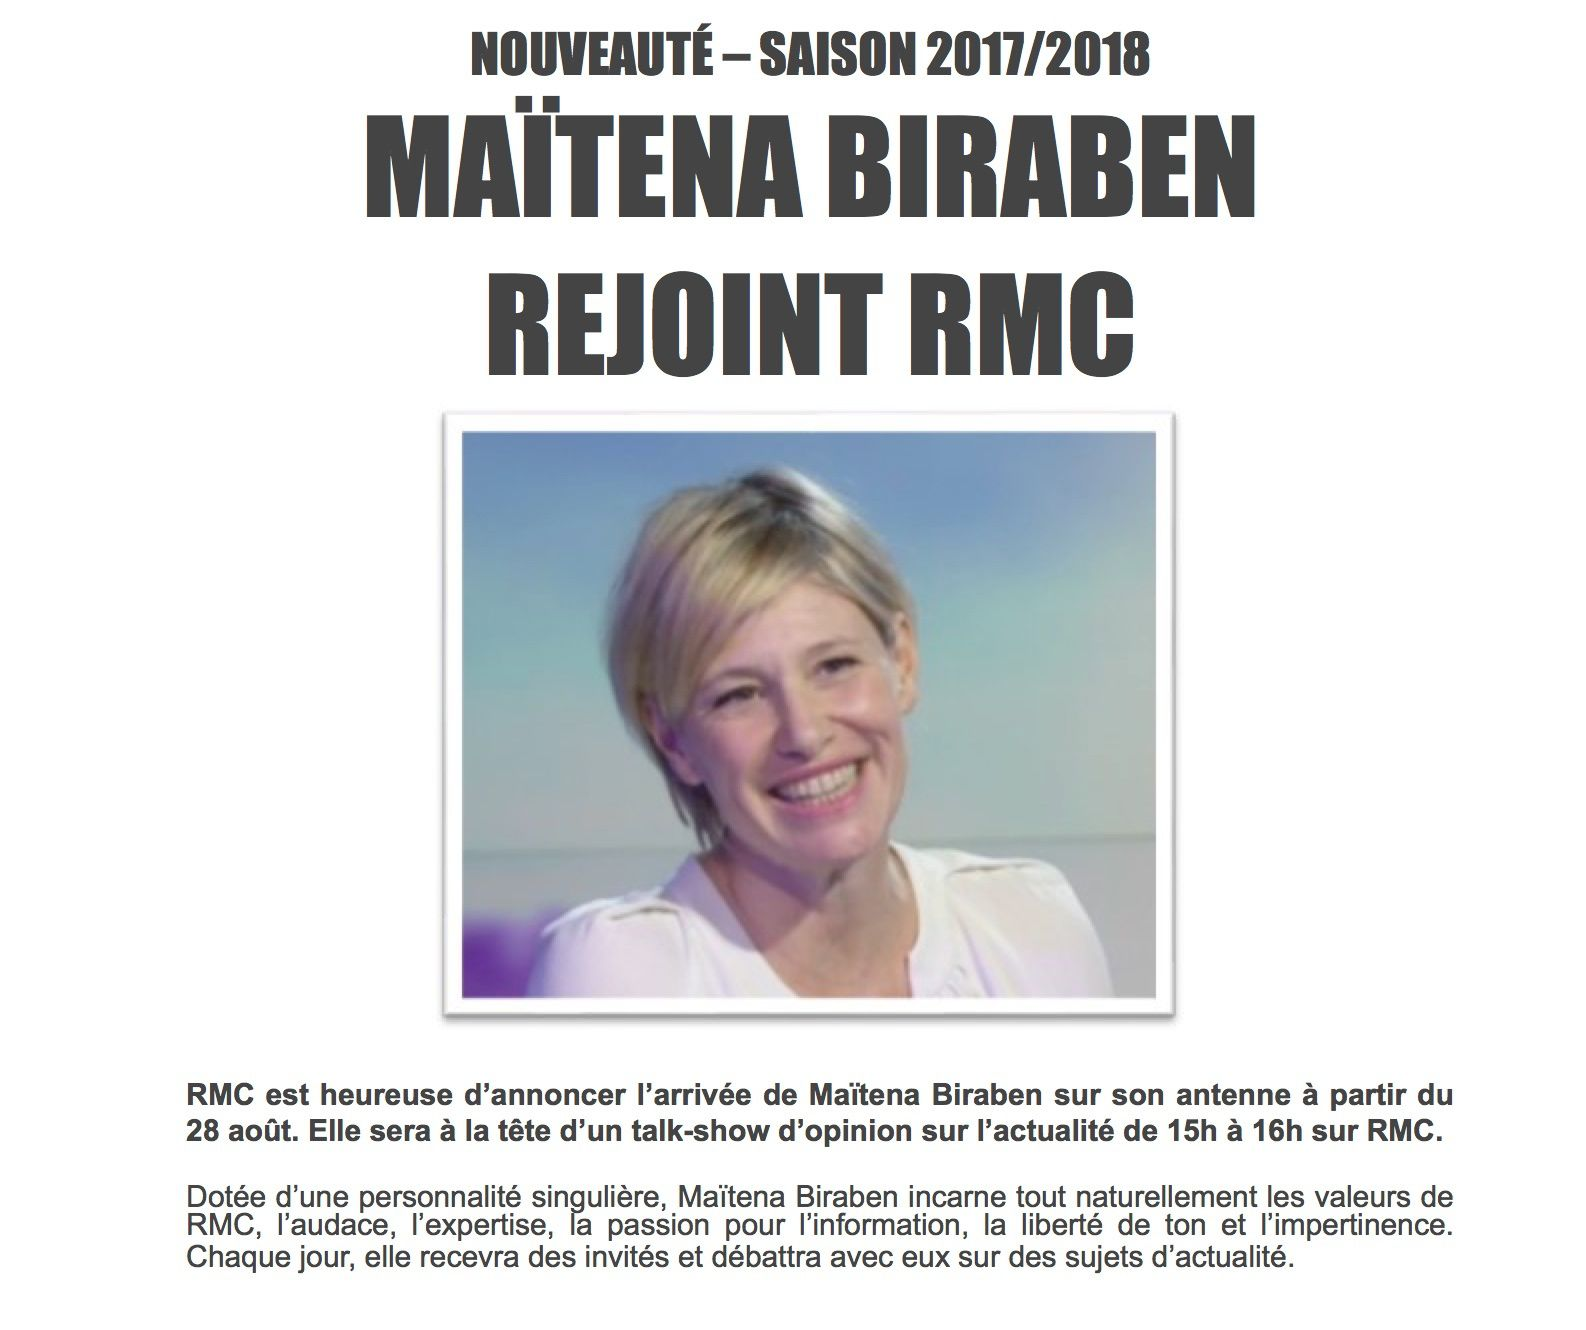 Maïtena Biraben rejoint RMC la saison prochaine.